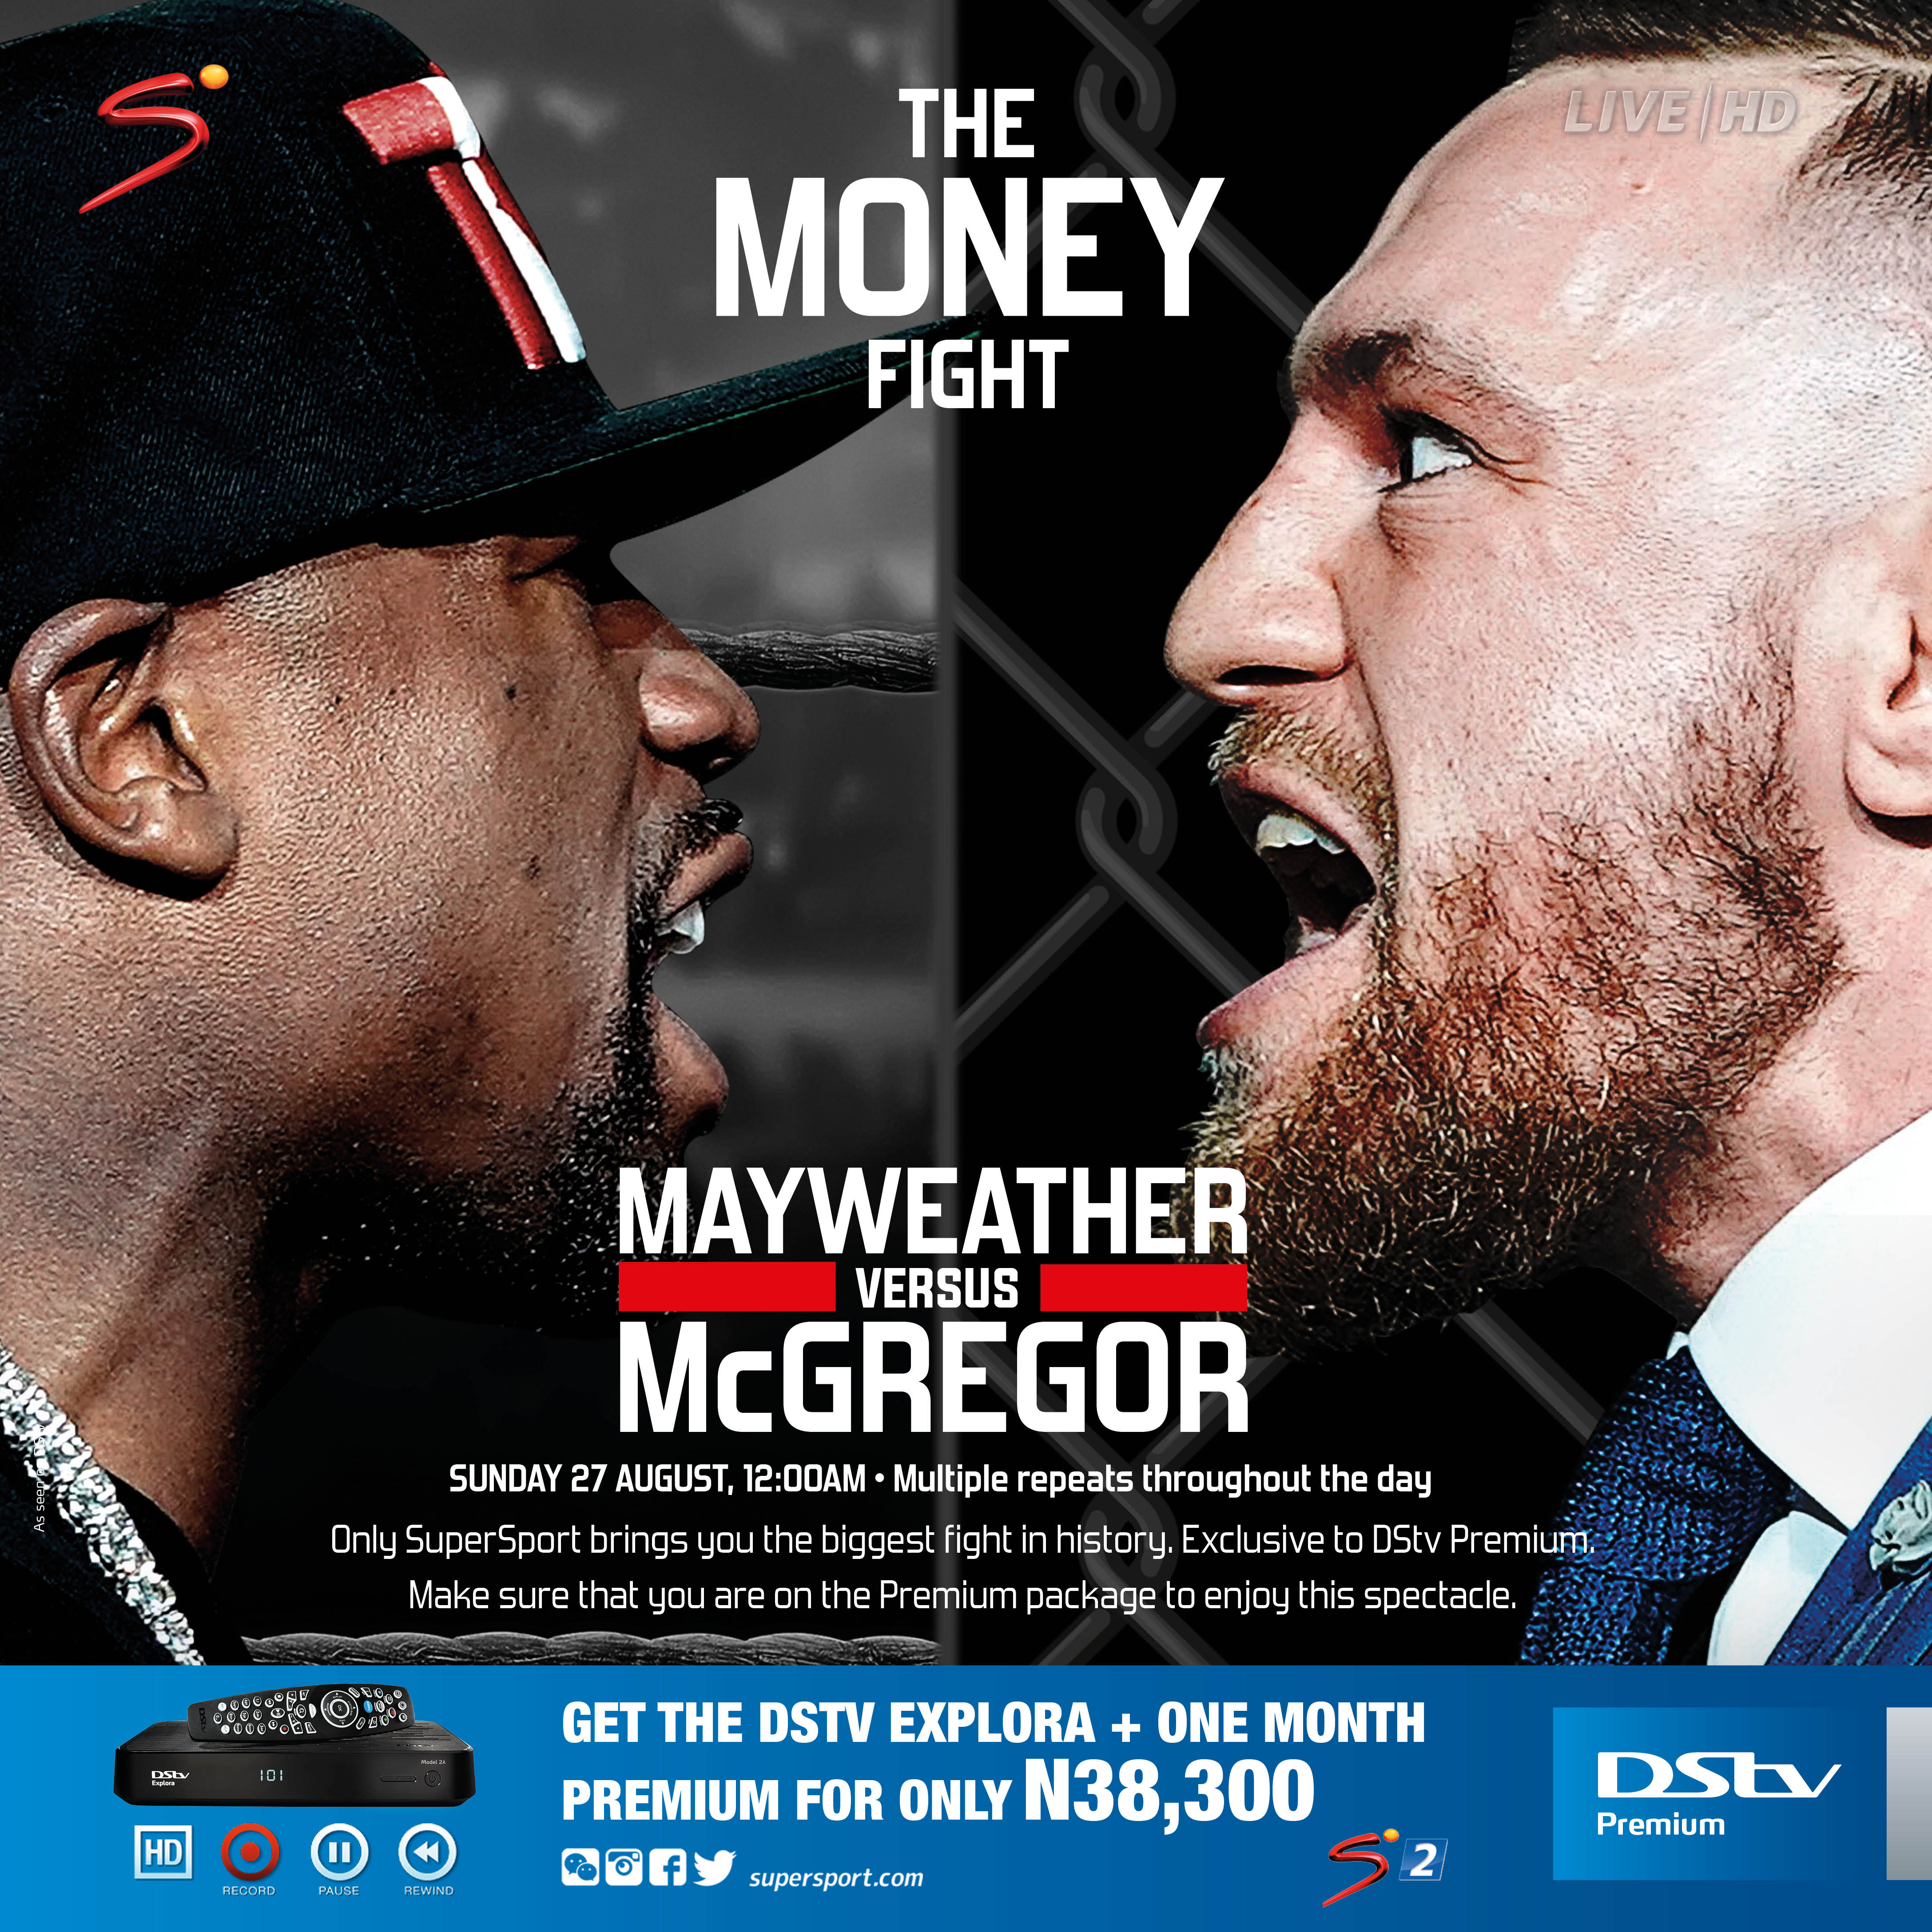 Catch The Money Fight LIVE on DStv Premium